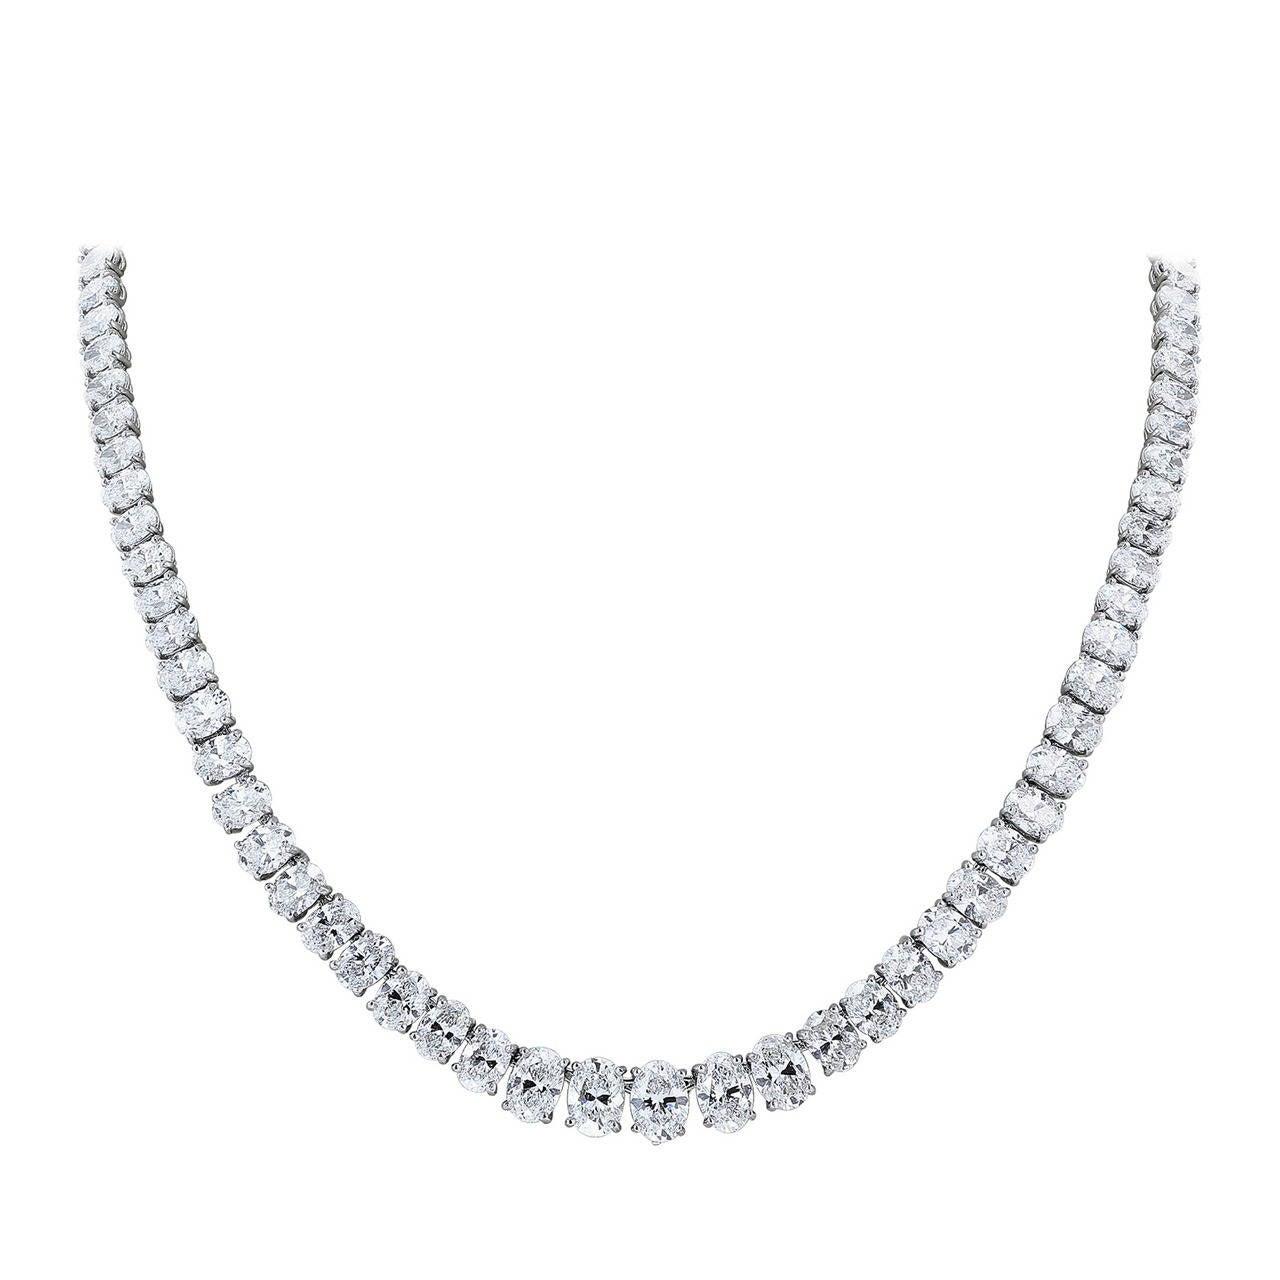 Oscar Heyman 30.99 Carat Oval Diamond Platinum Necklace